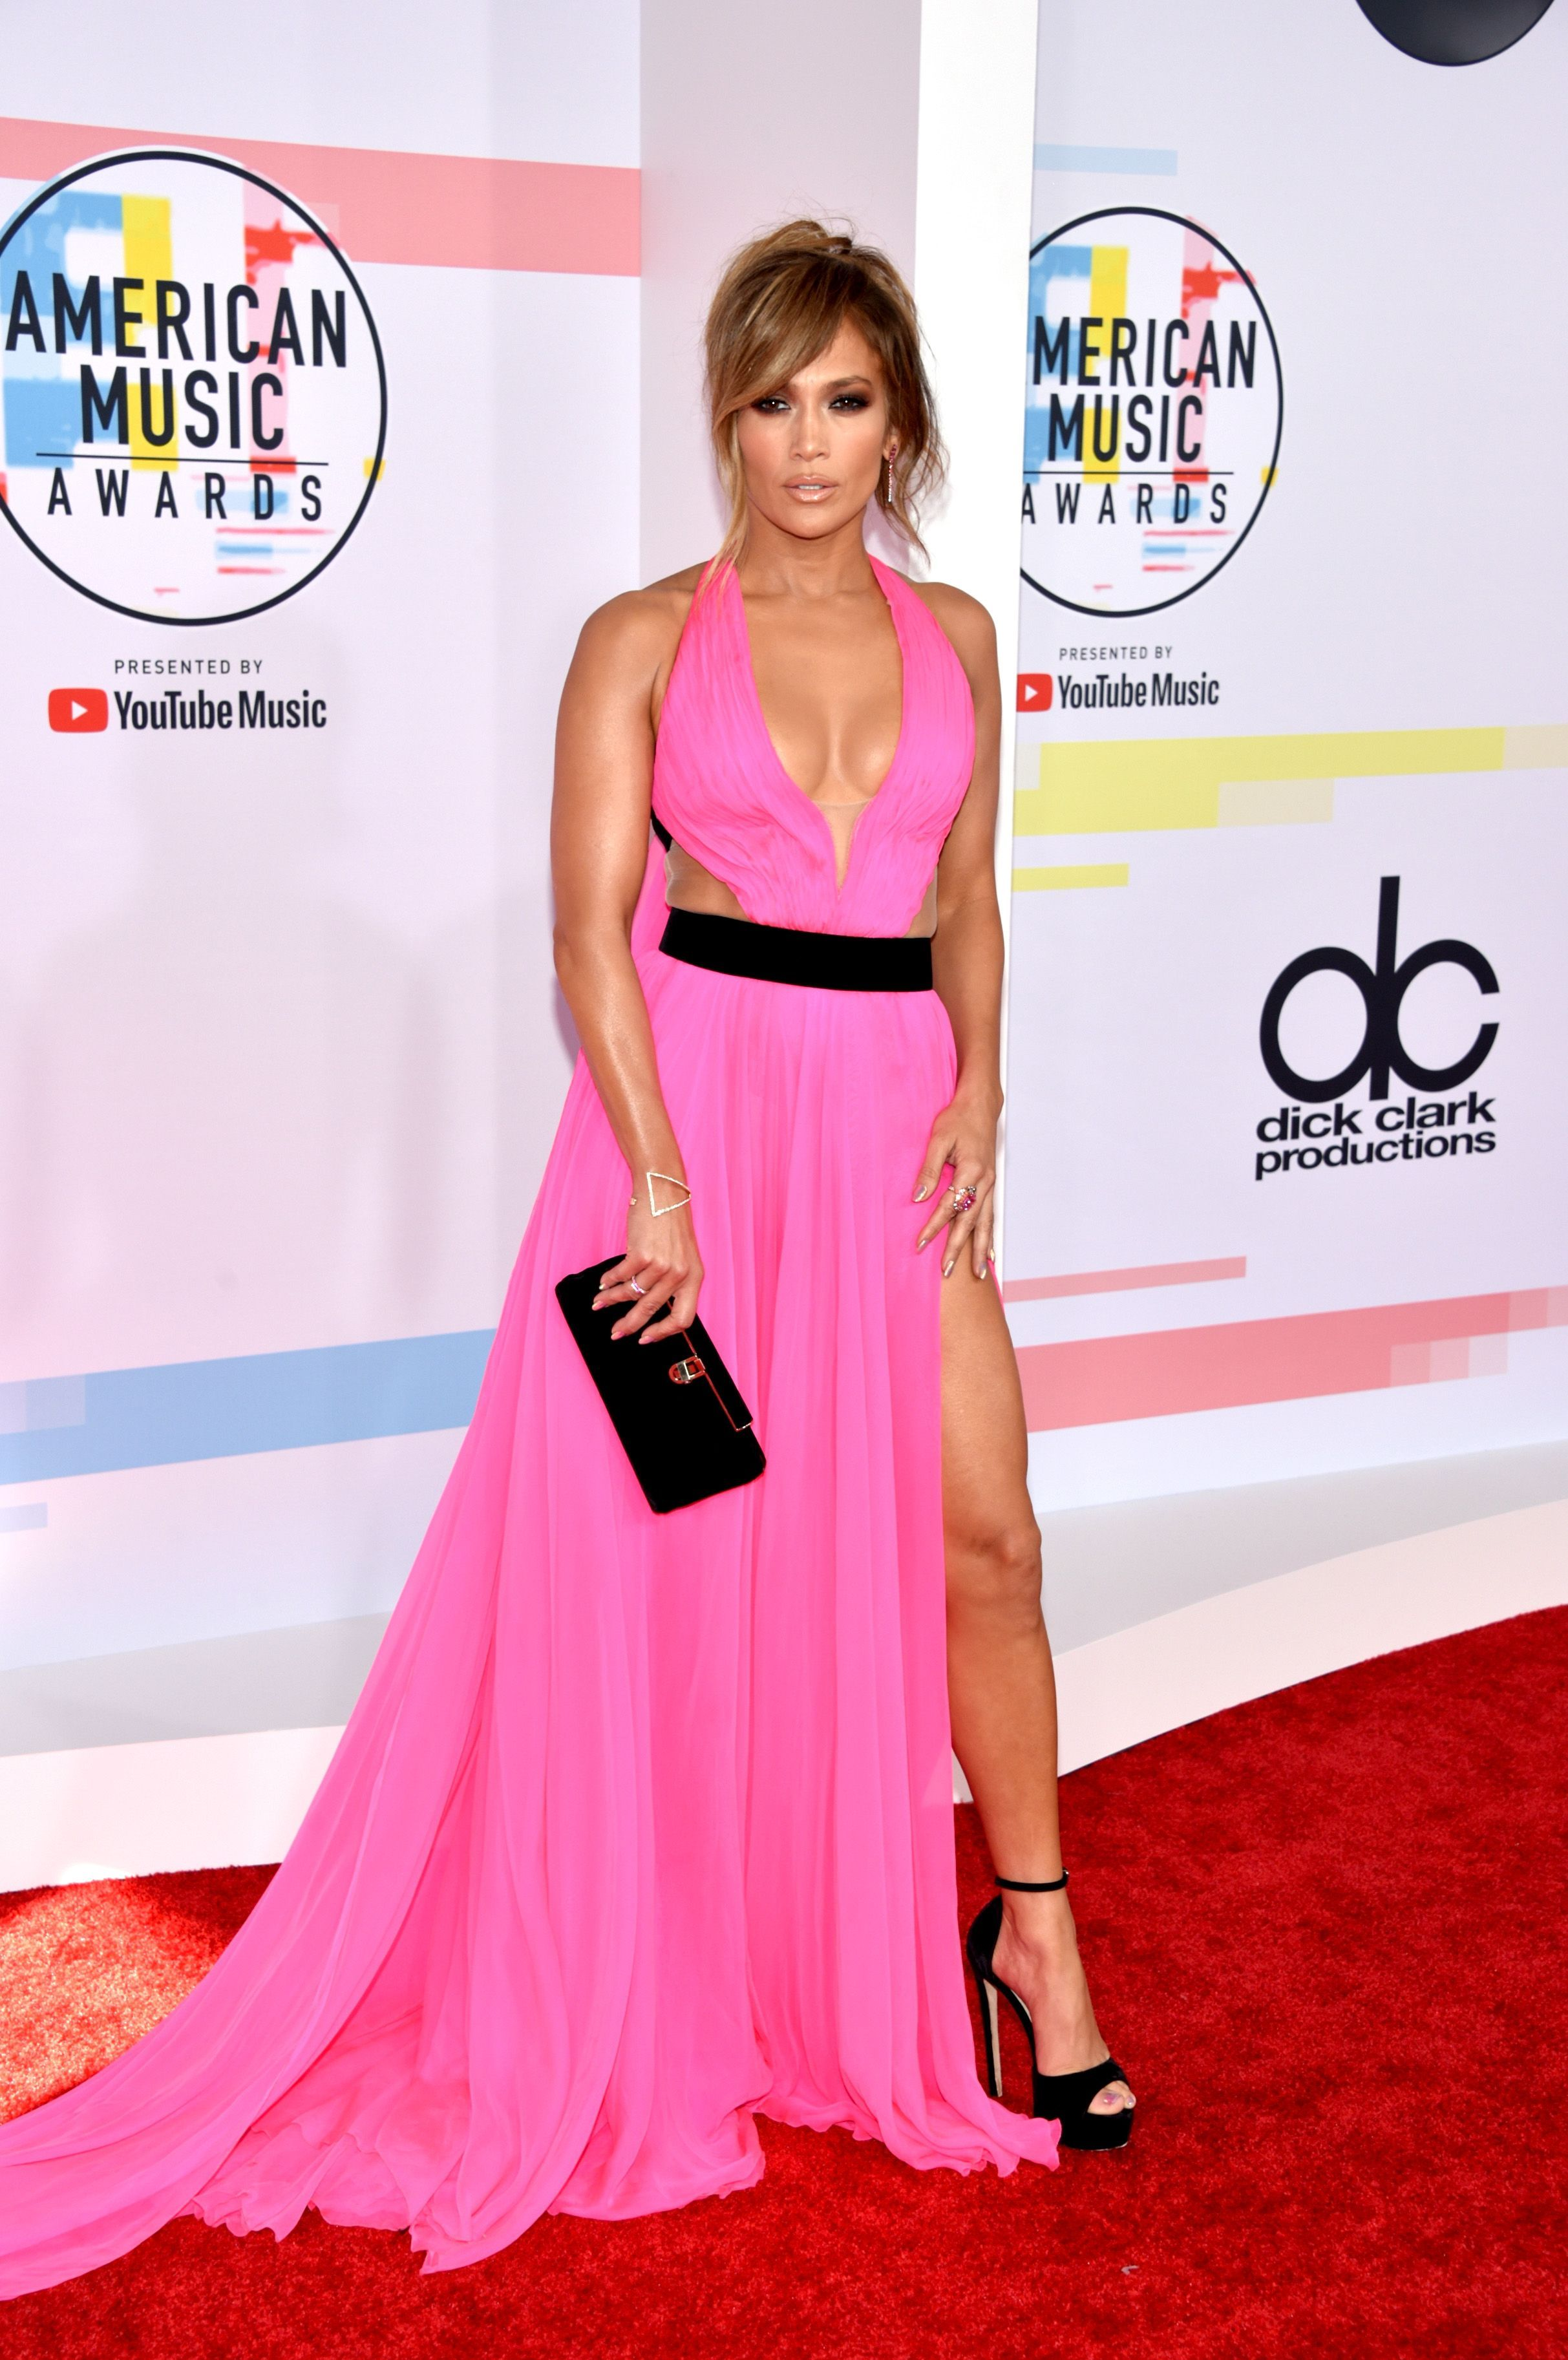 Jennifer Lopez Cleavage At American Music Awards - Scandal